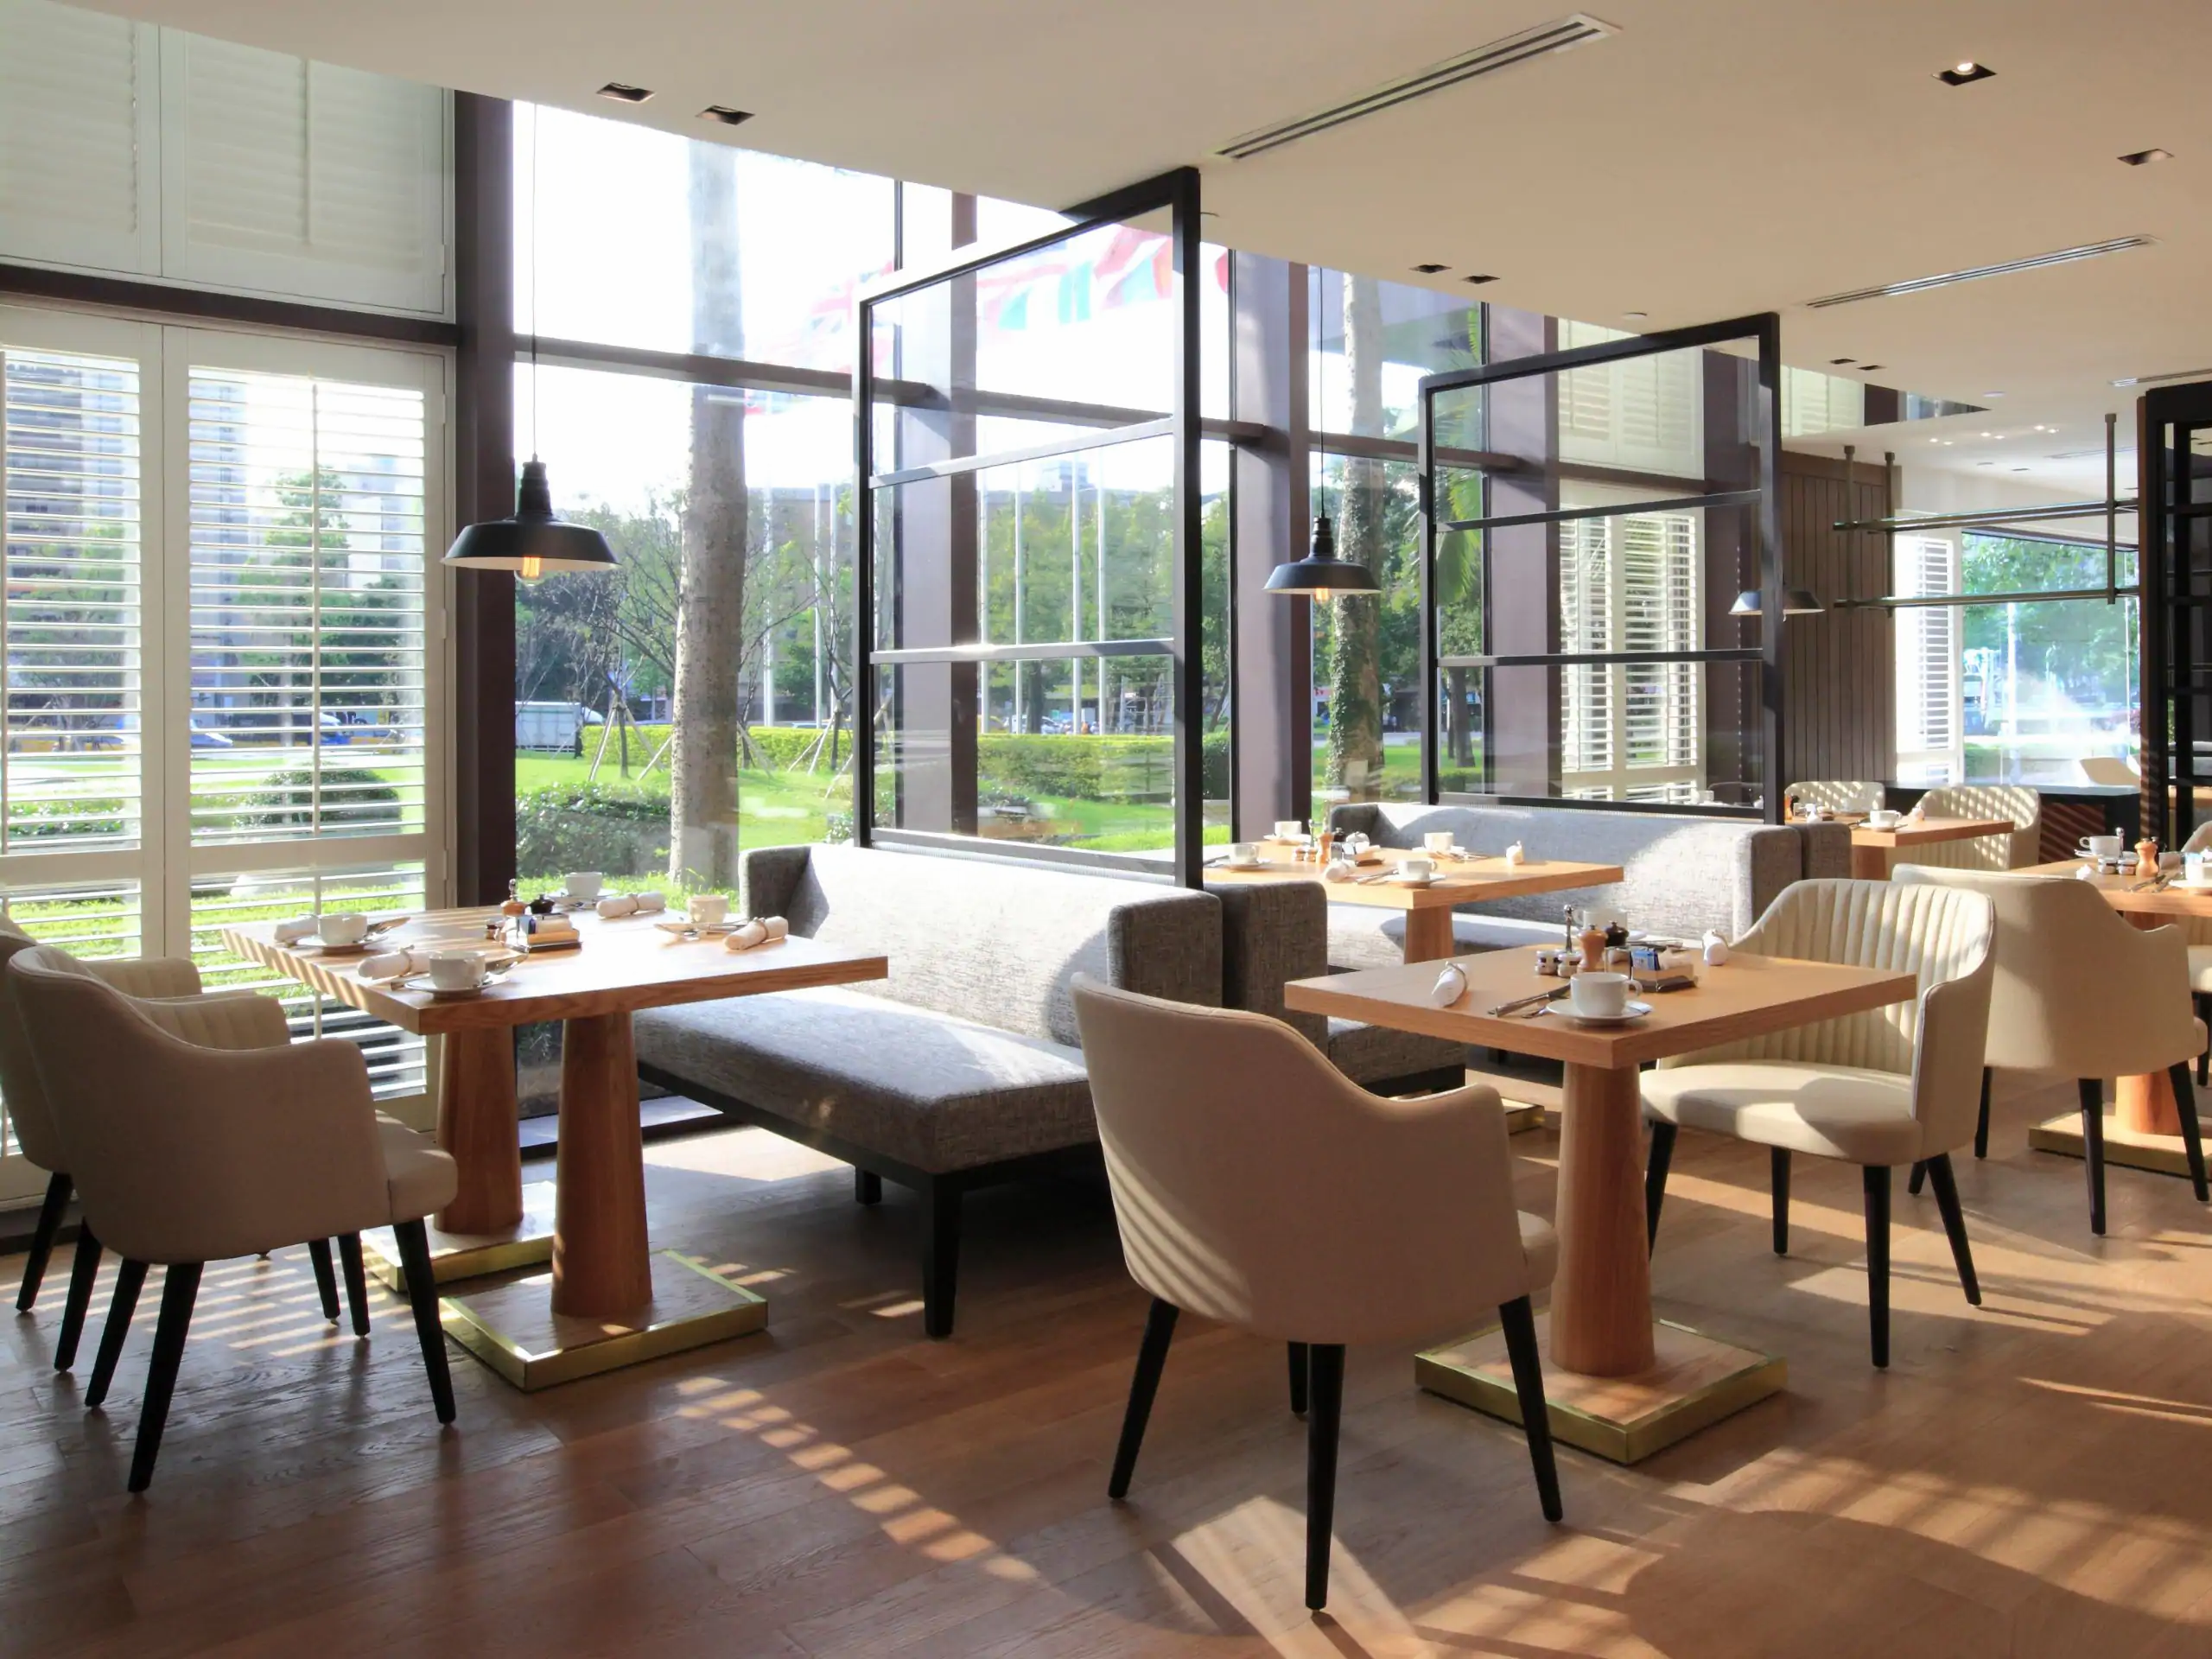 Grand-Hyatt-Taipei-P786-Cafe-Area-Seat